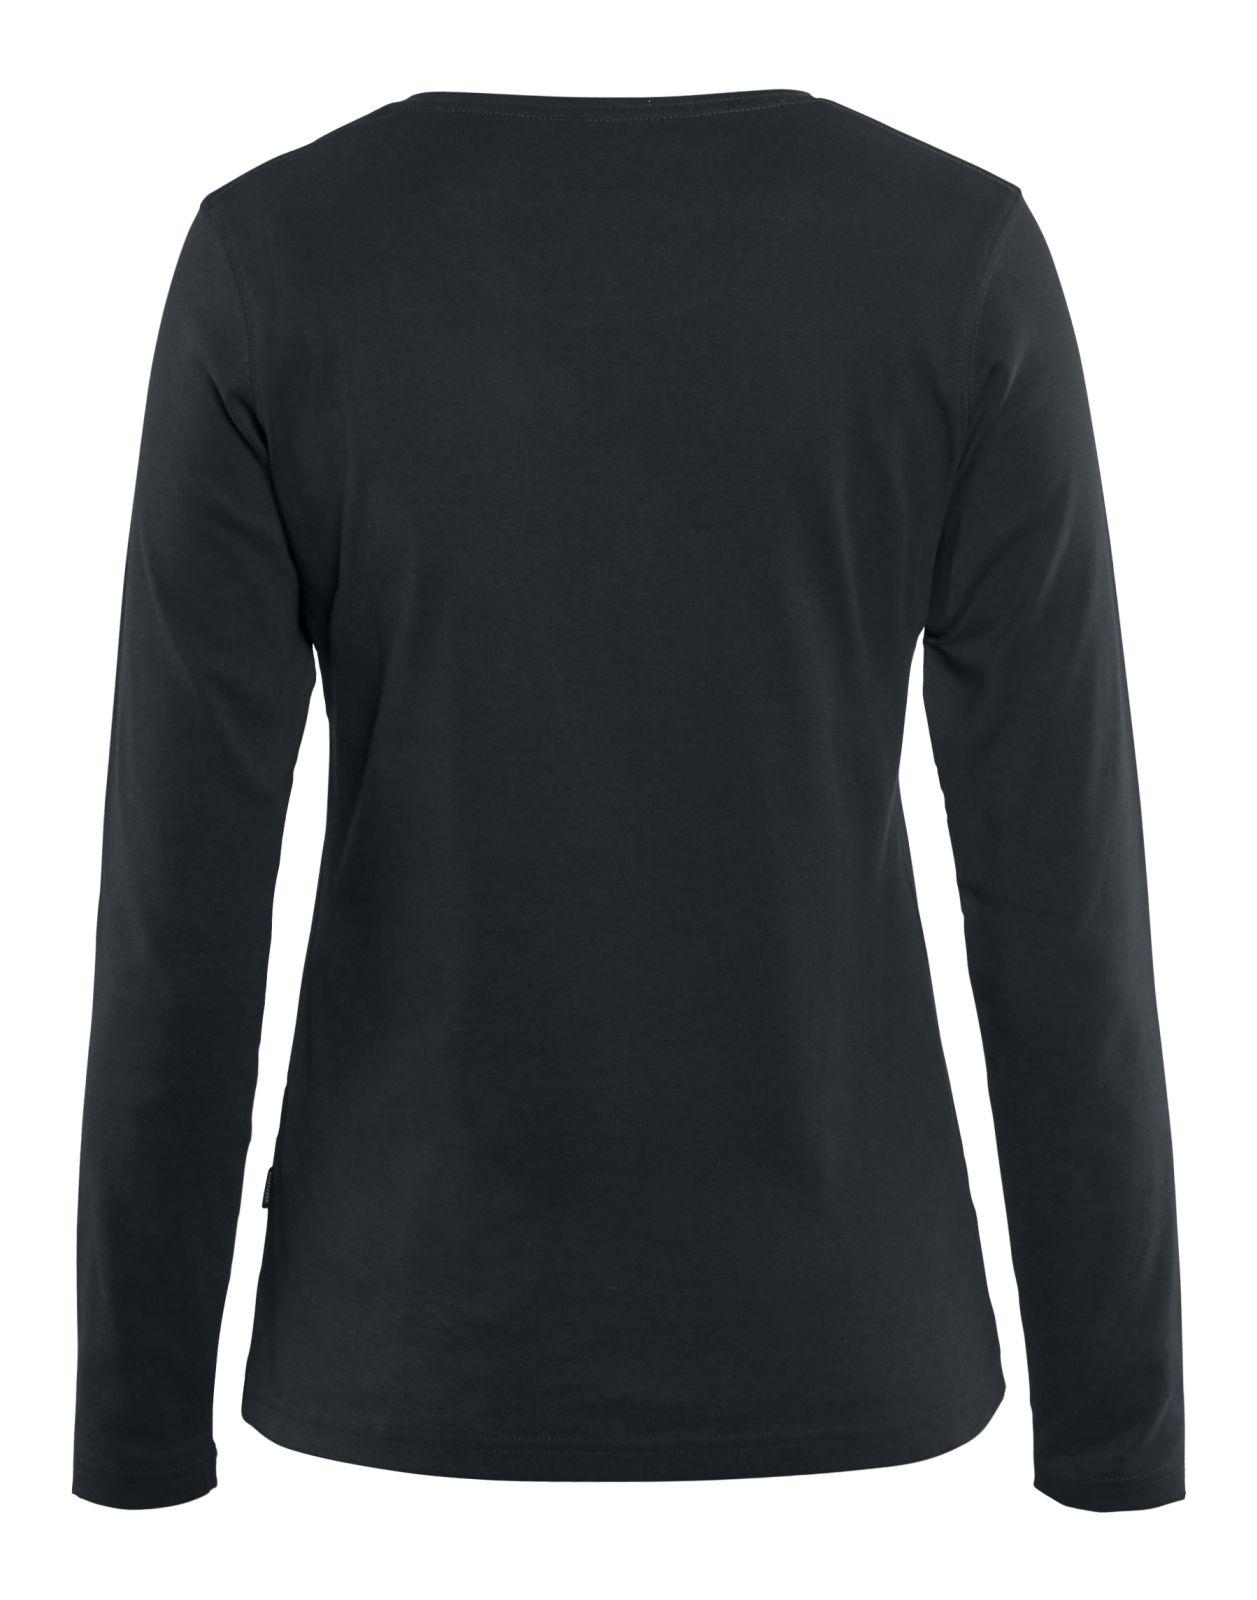 Blaklader Dames T-shirts 33011032 marineblauw(8600)